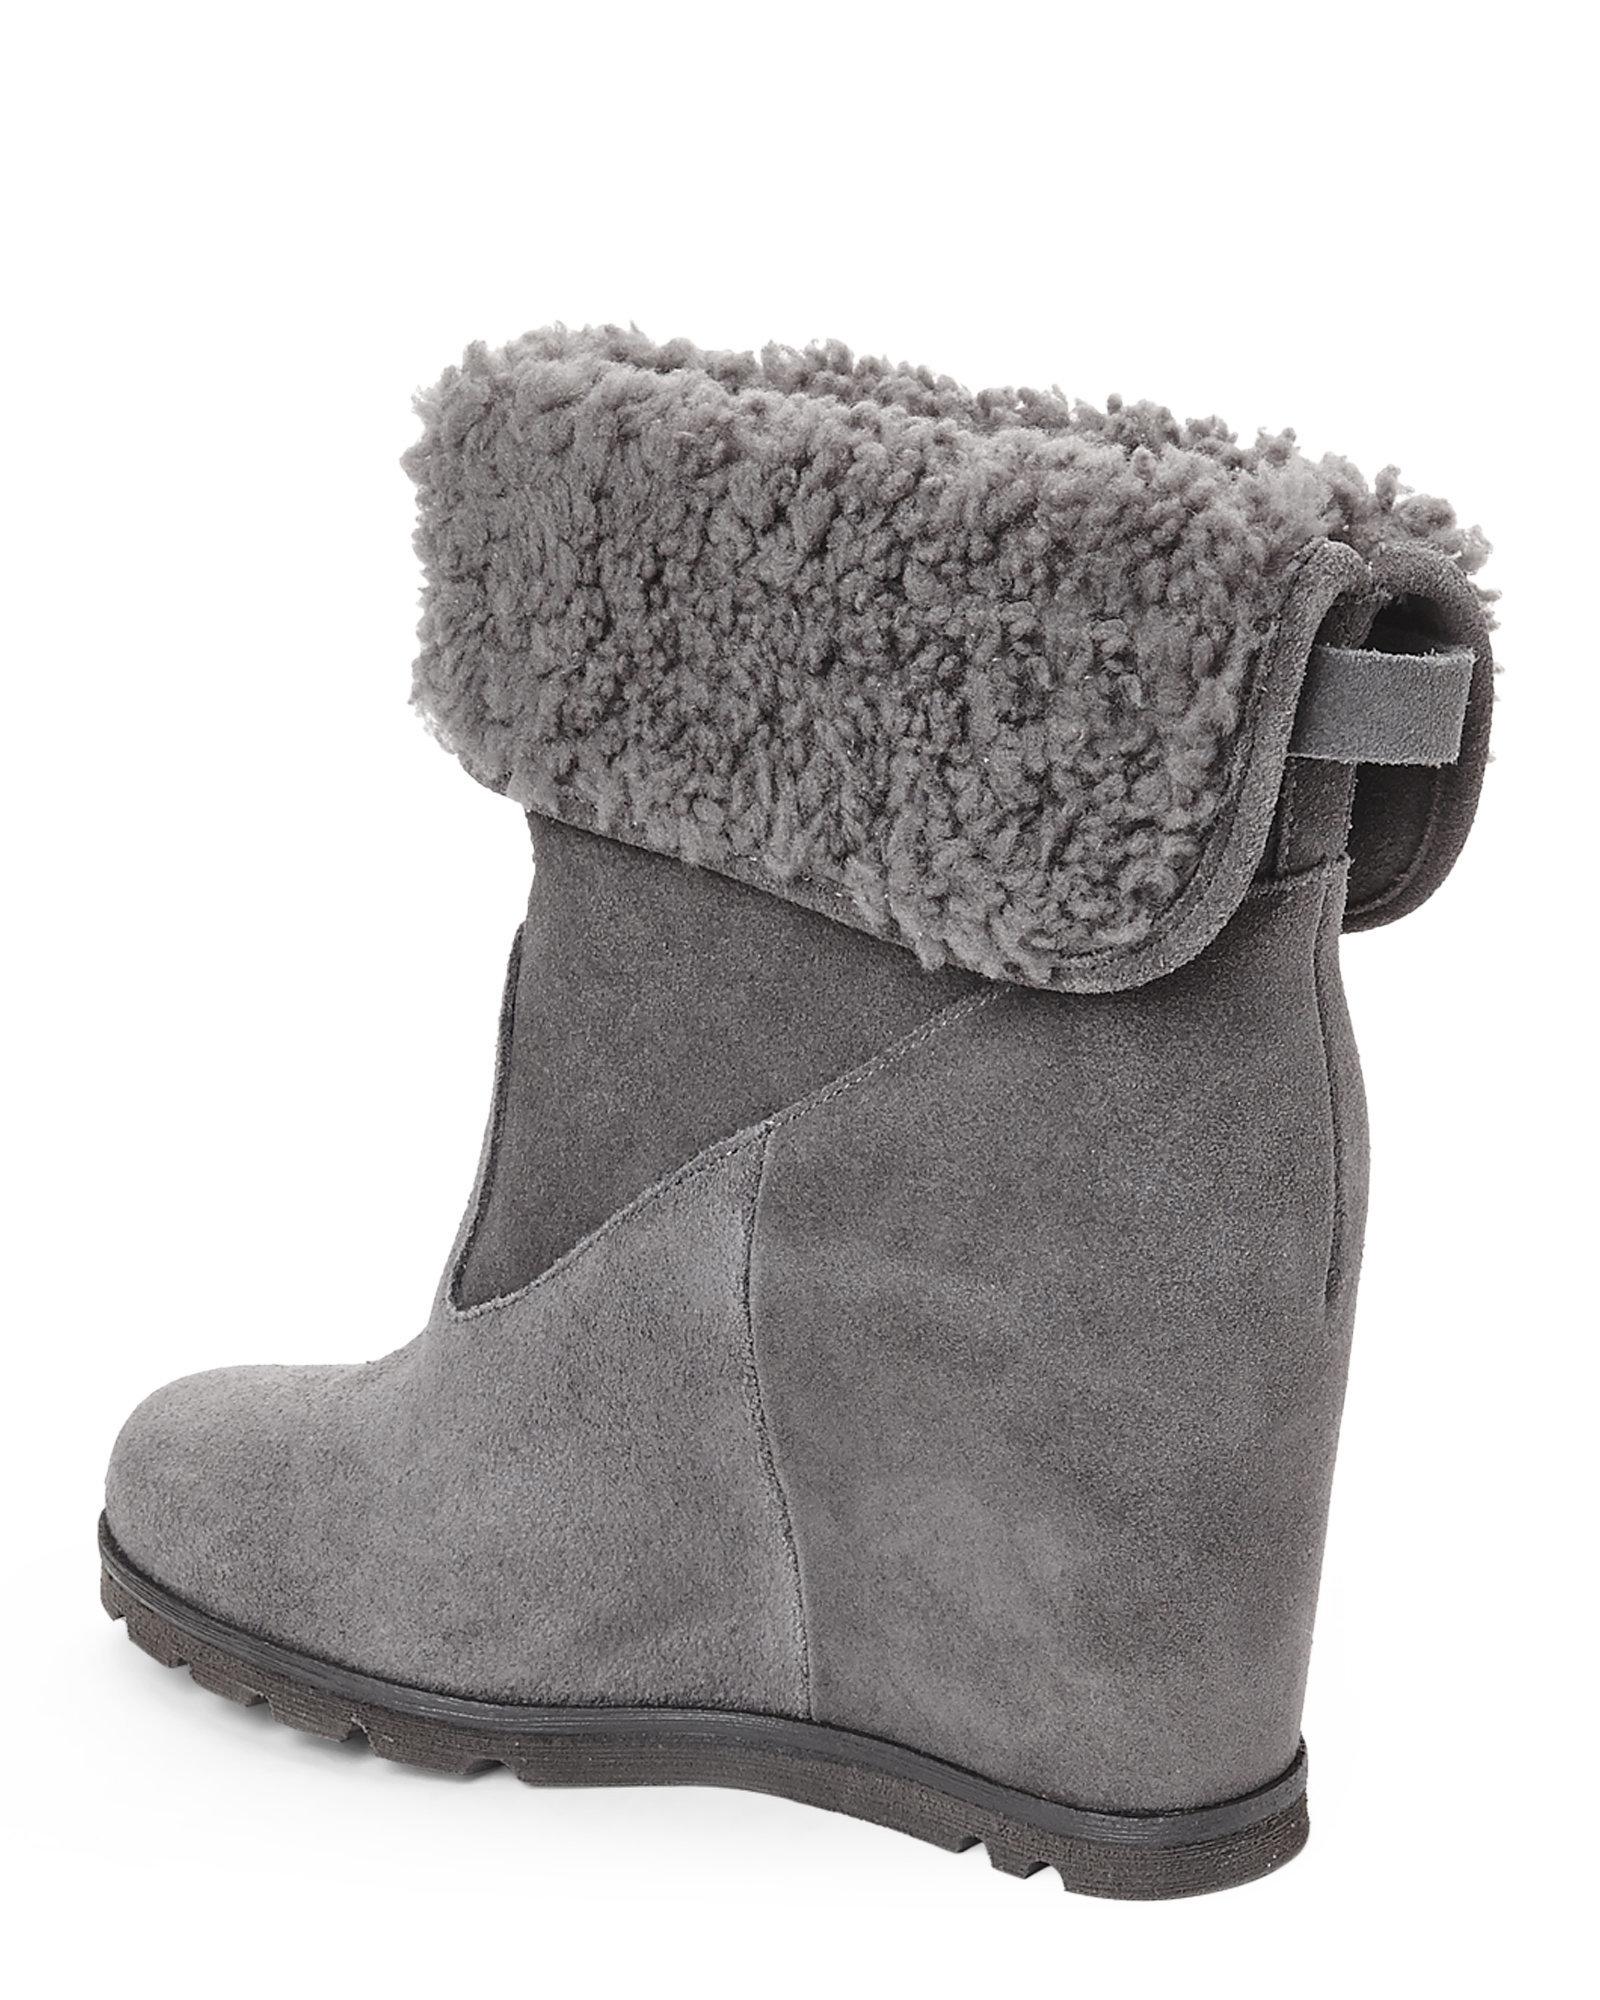 ugg kyra wedge boots